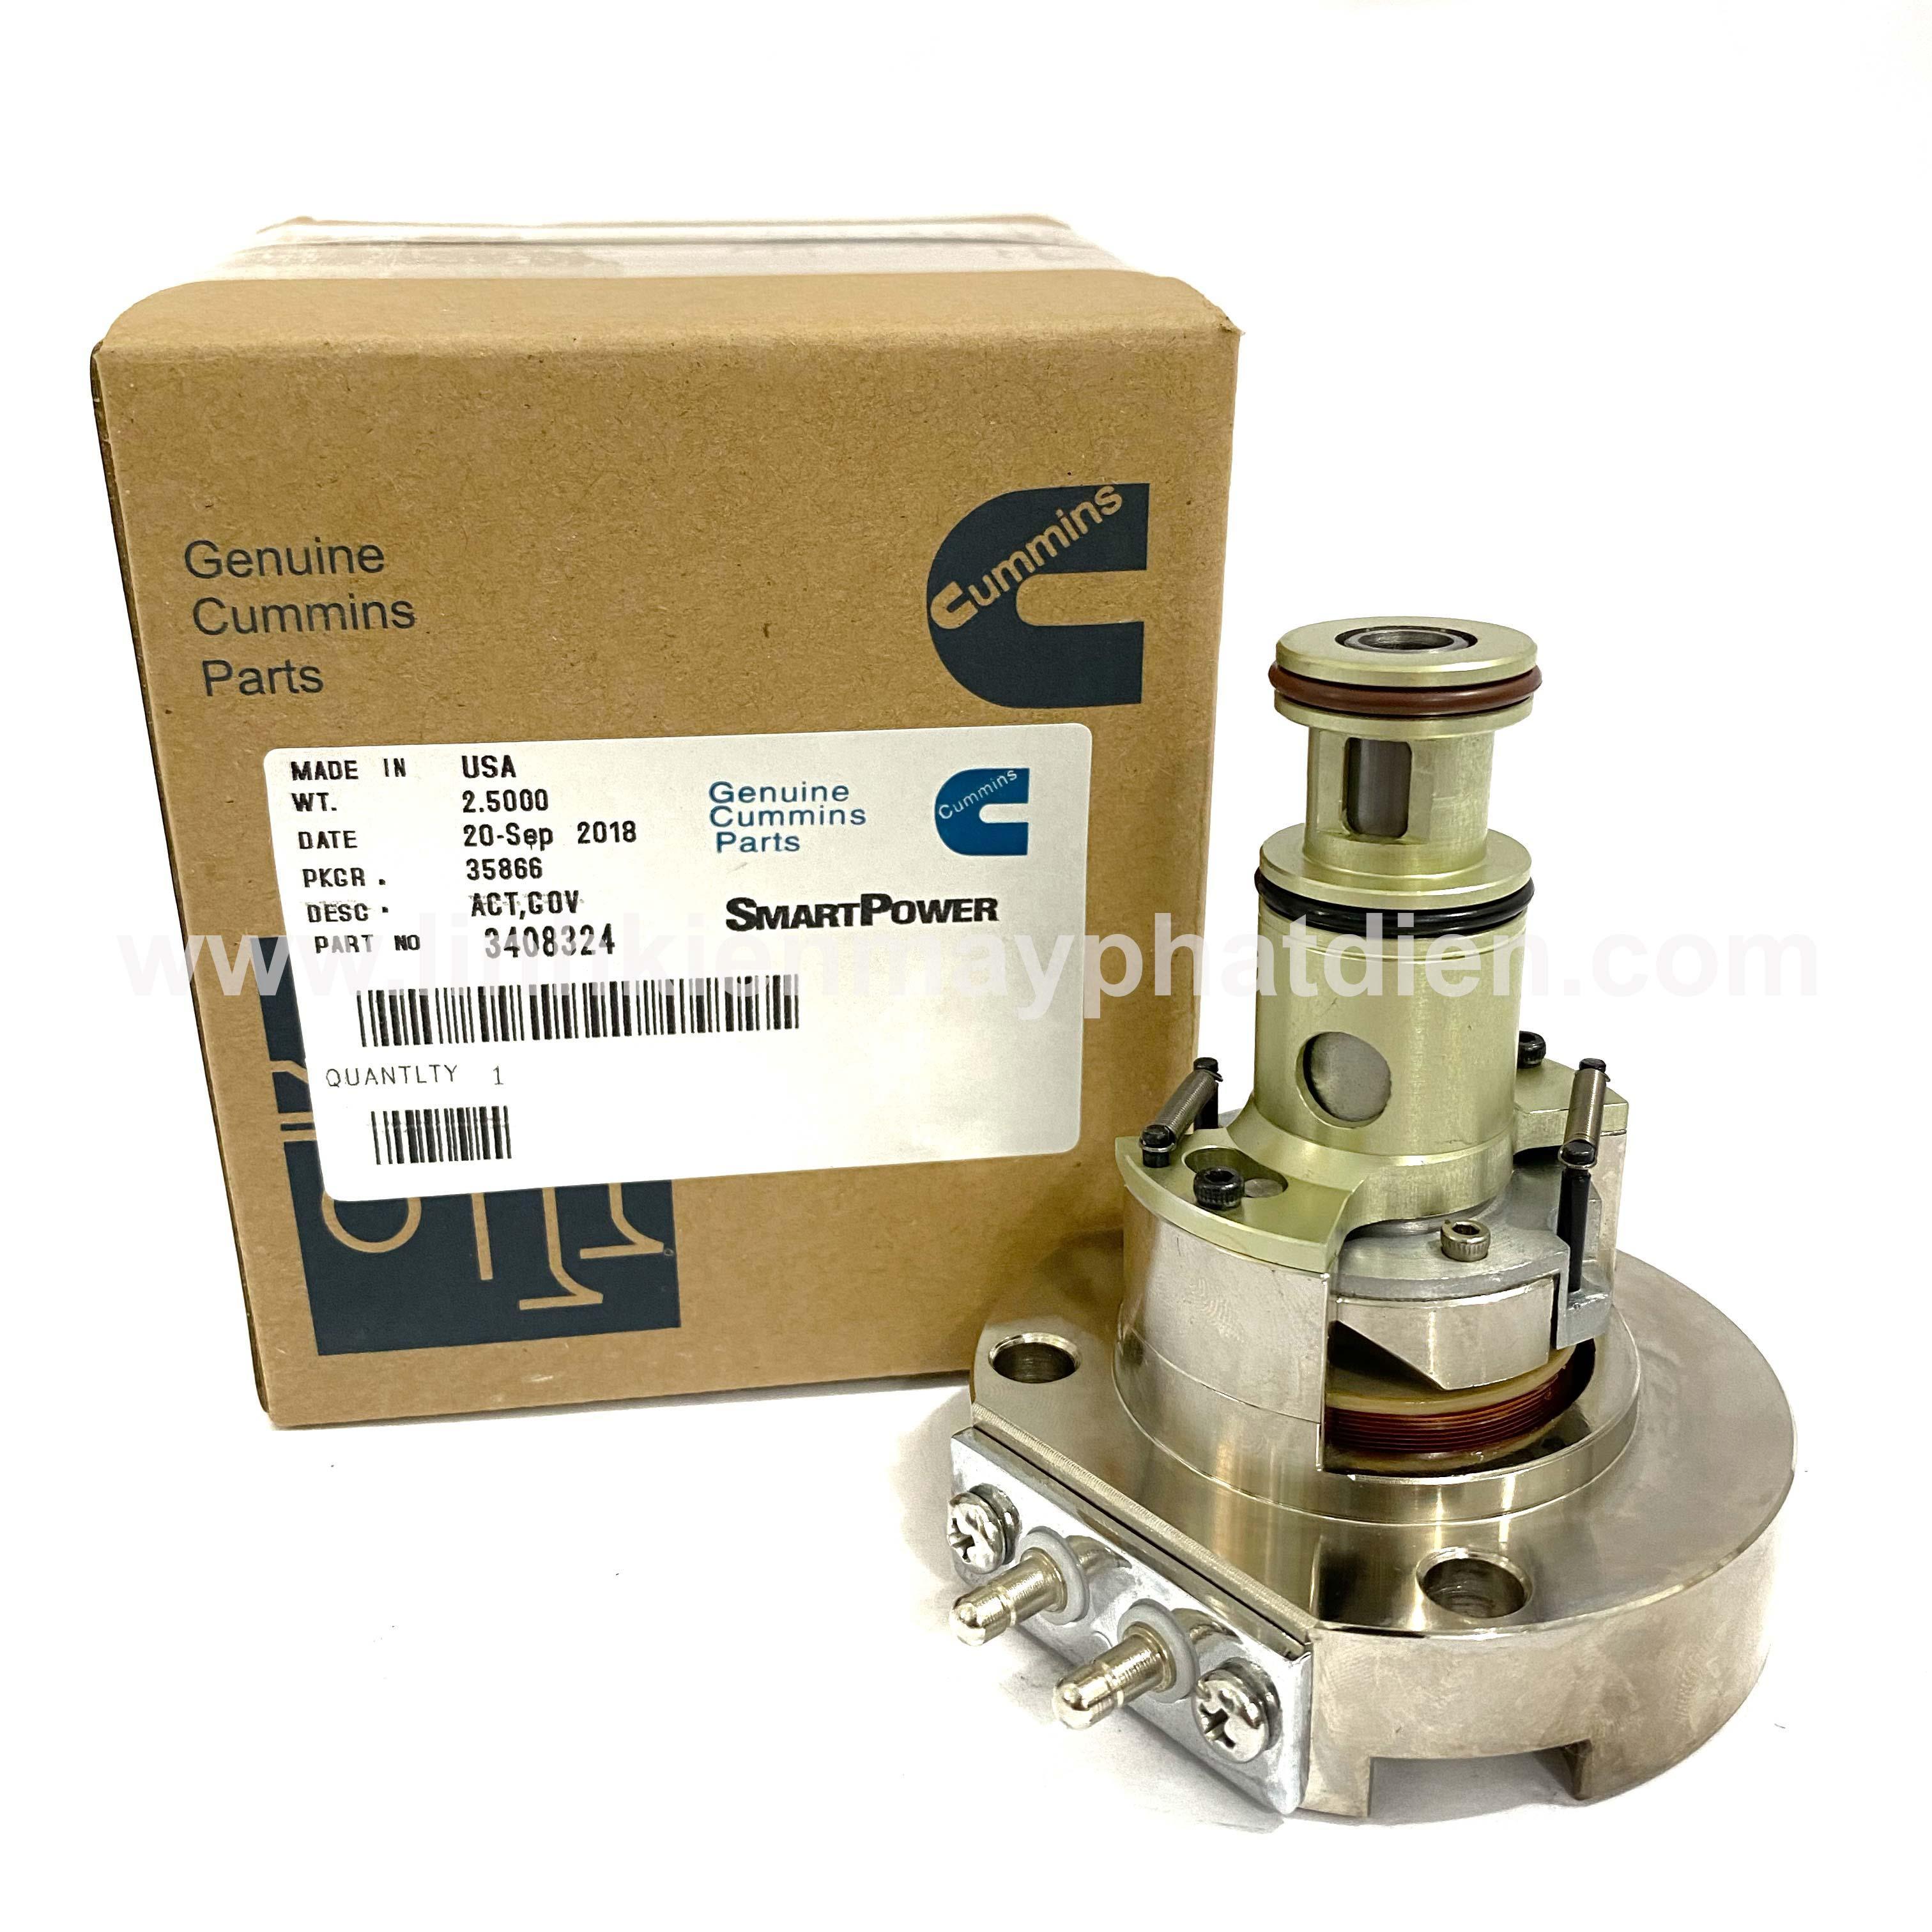 Actuator máy phát điện 3408324